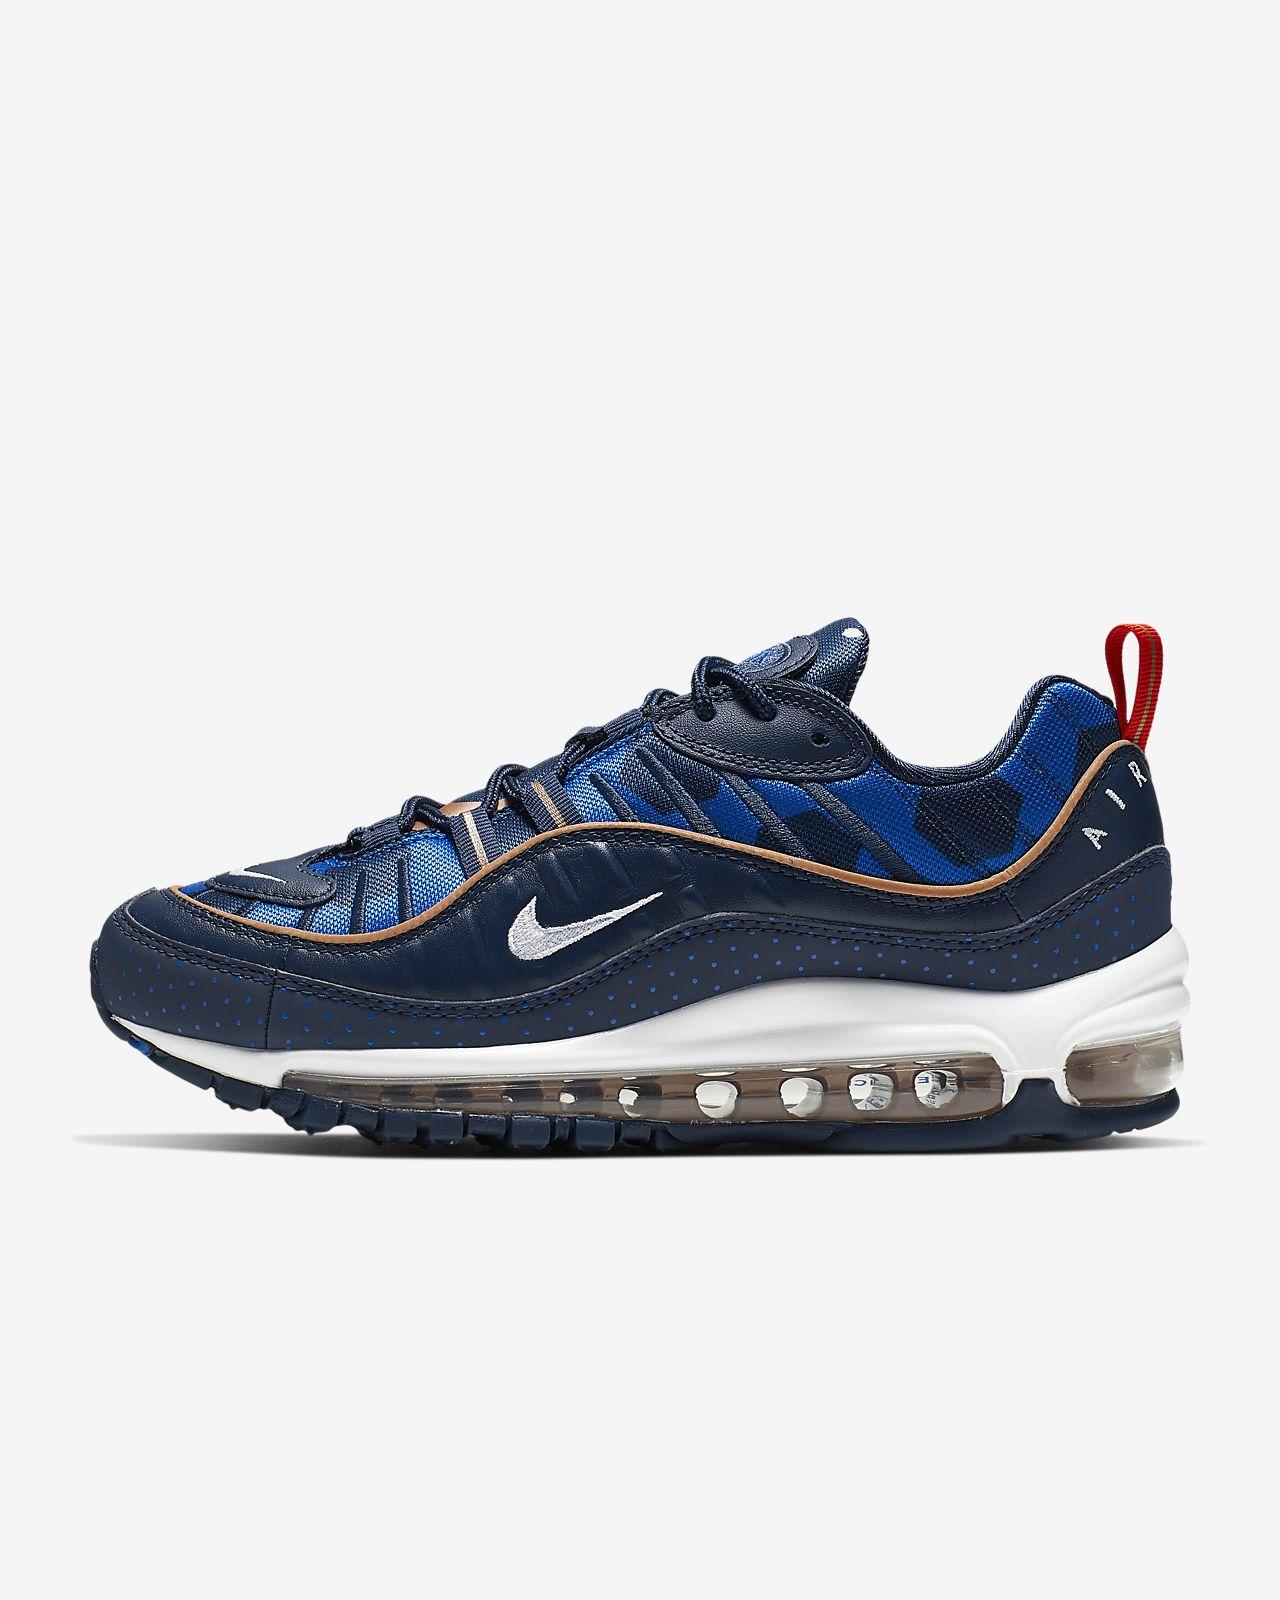 Nike Air Max 98 Premium Unité Totale Kadın Ayakkabısı